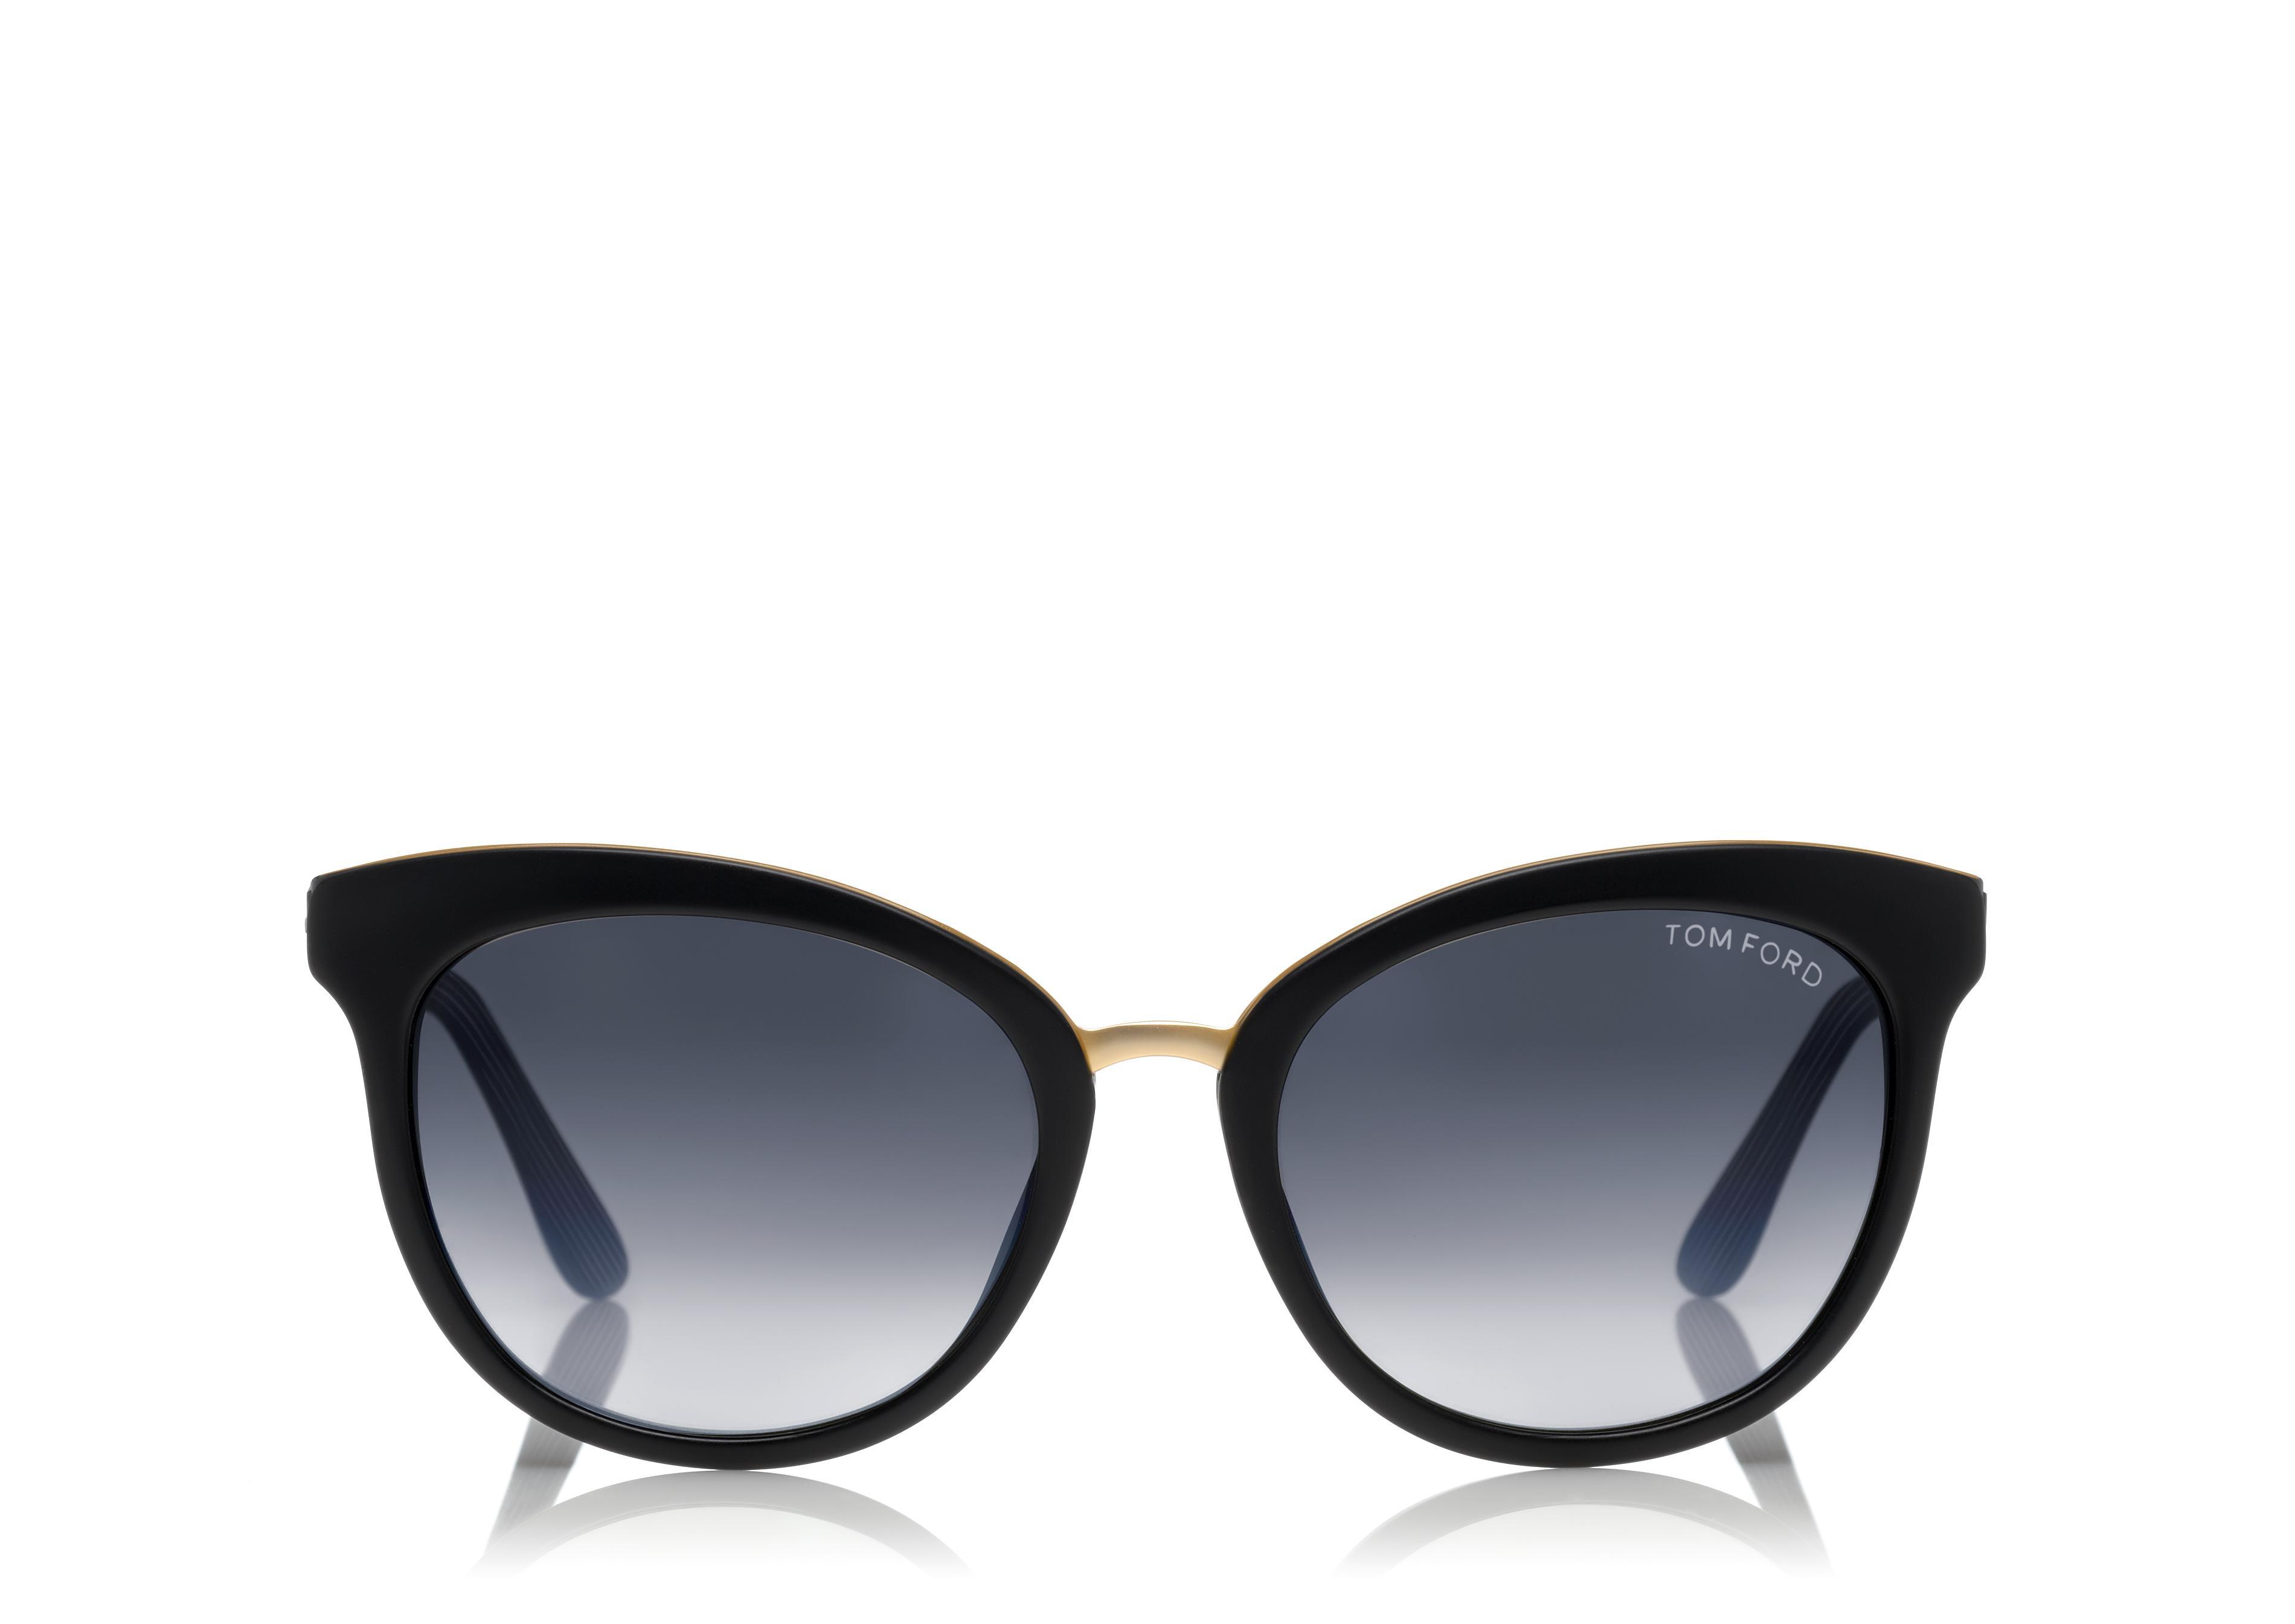 FT0461 Tom Ford Sonnenbrille Emma